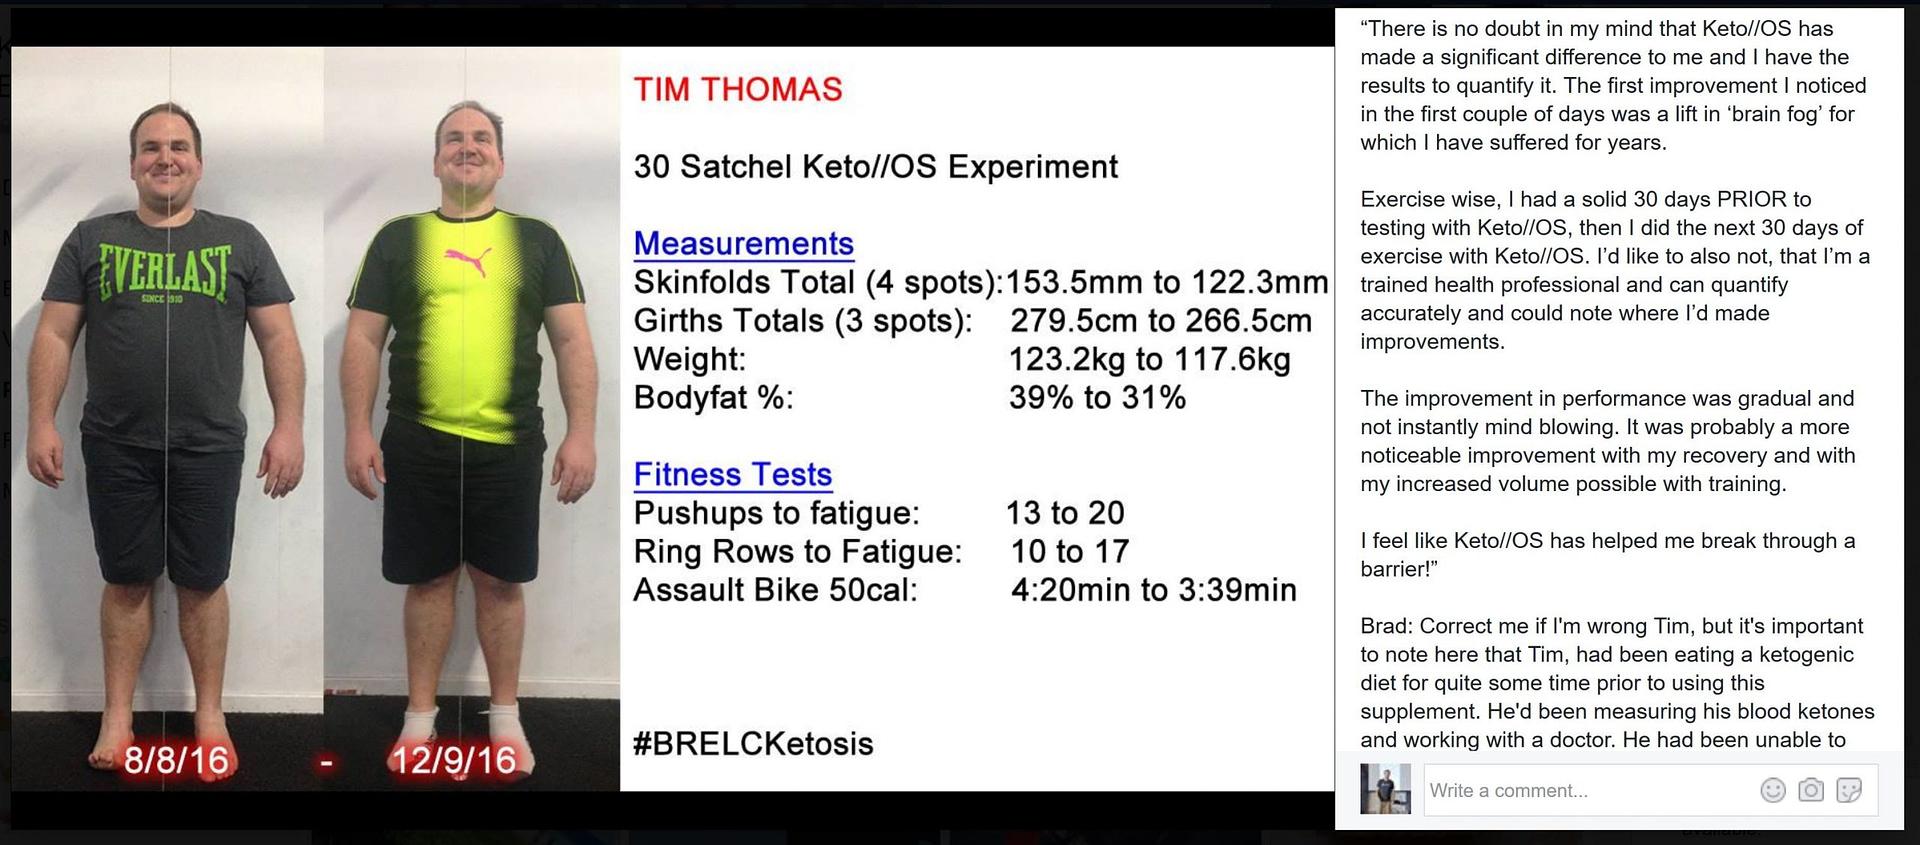 Brain Fog - Fat Loss - Performance - Tim Thomas